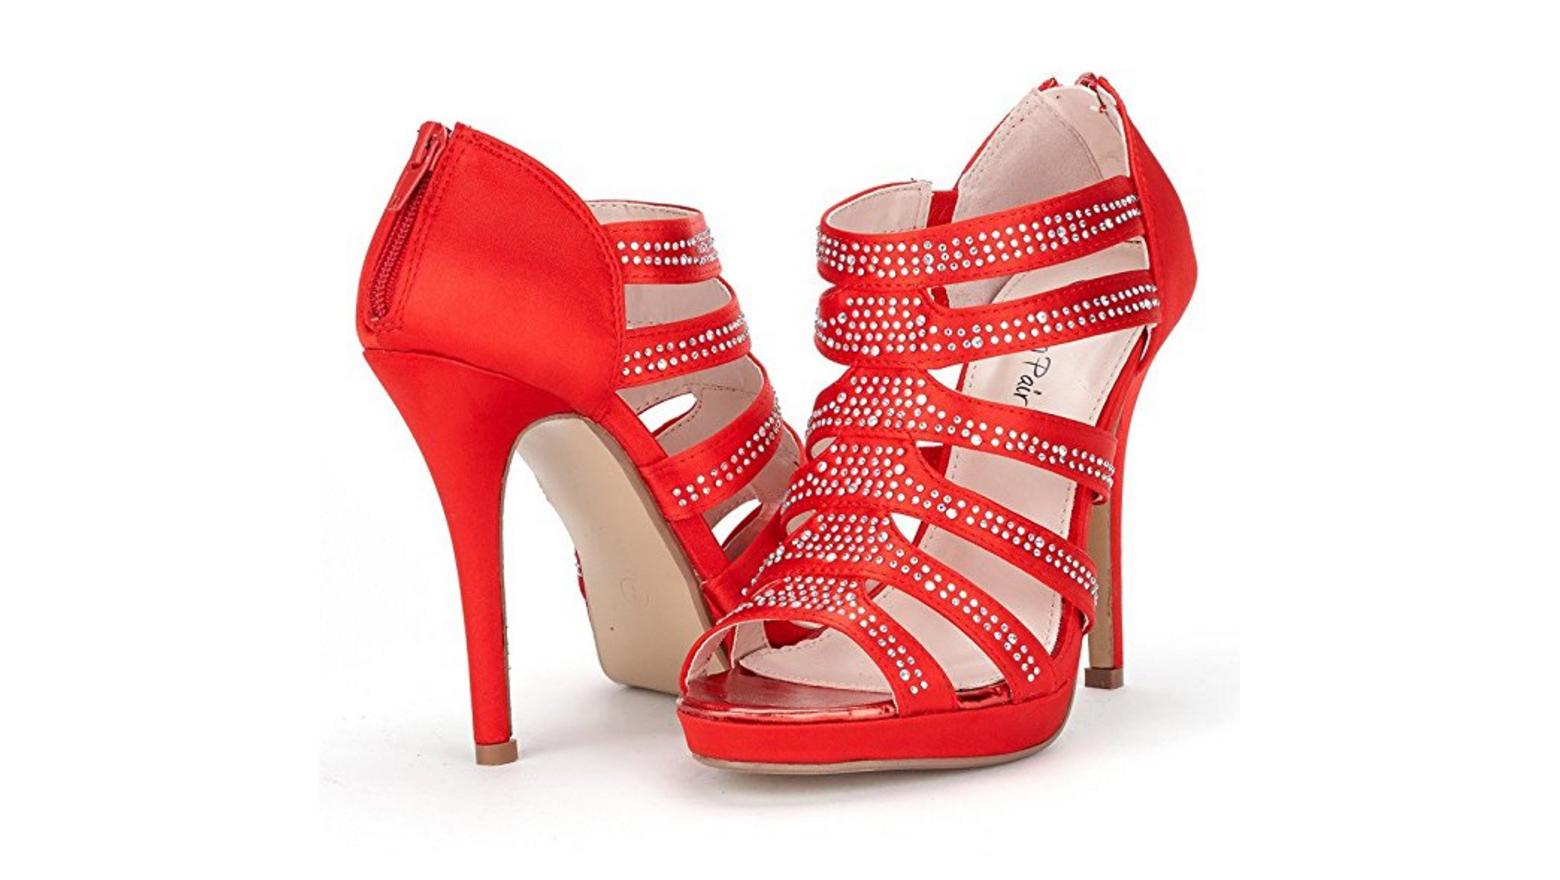 Amazon, cyber monday, cyber monday sales, cyber monday deals, shoes, pump, peep toe pumps, heels